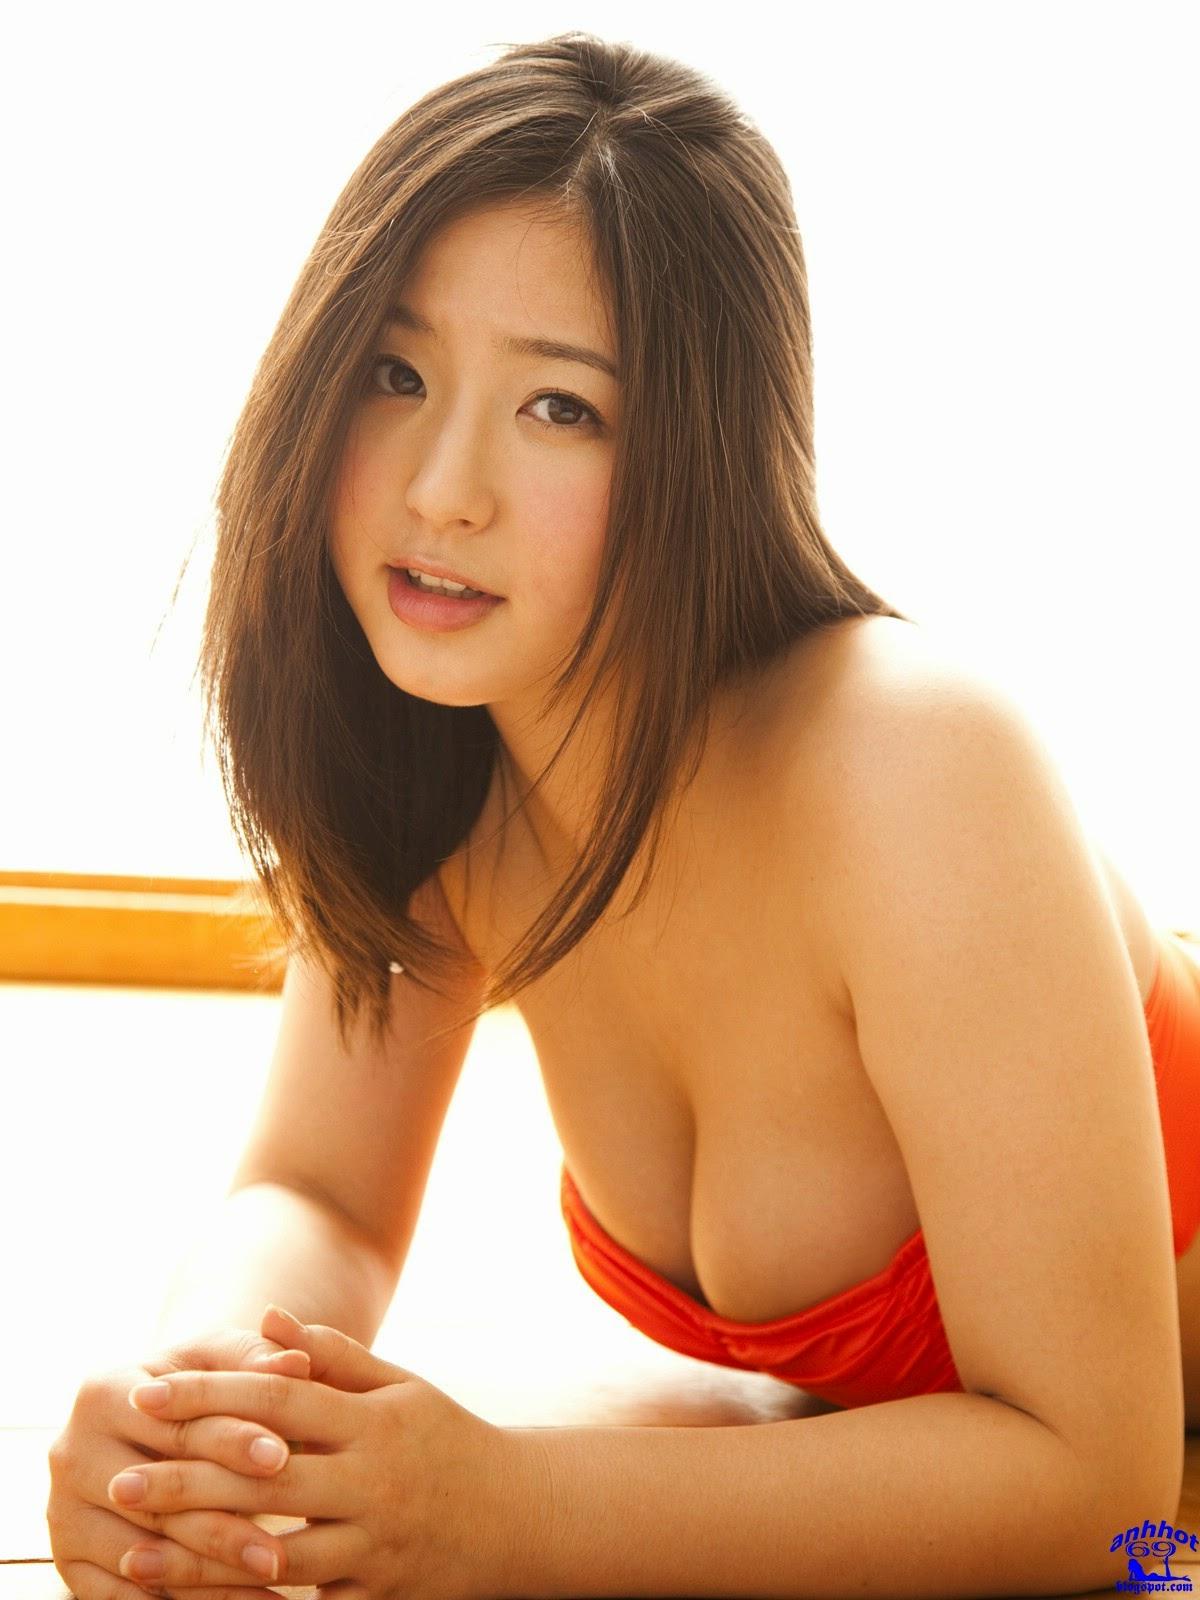 yuri-murakami-01844280